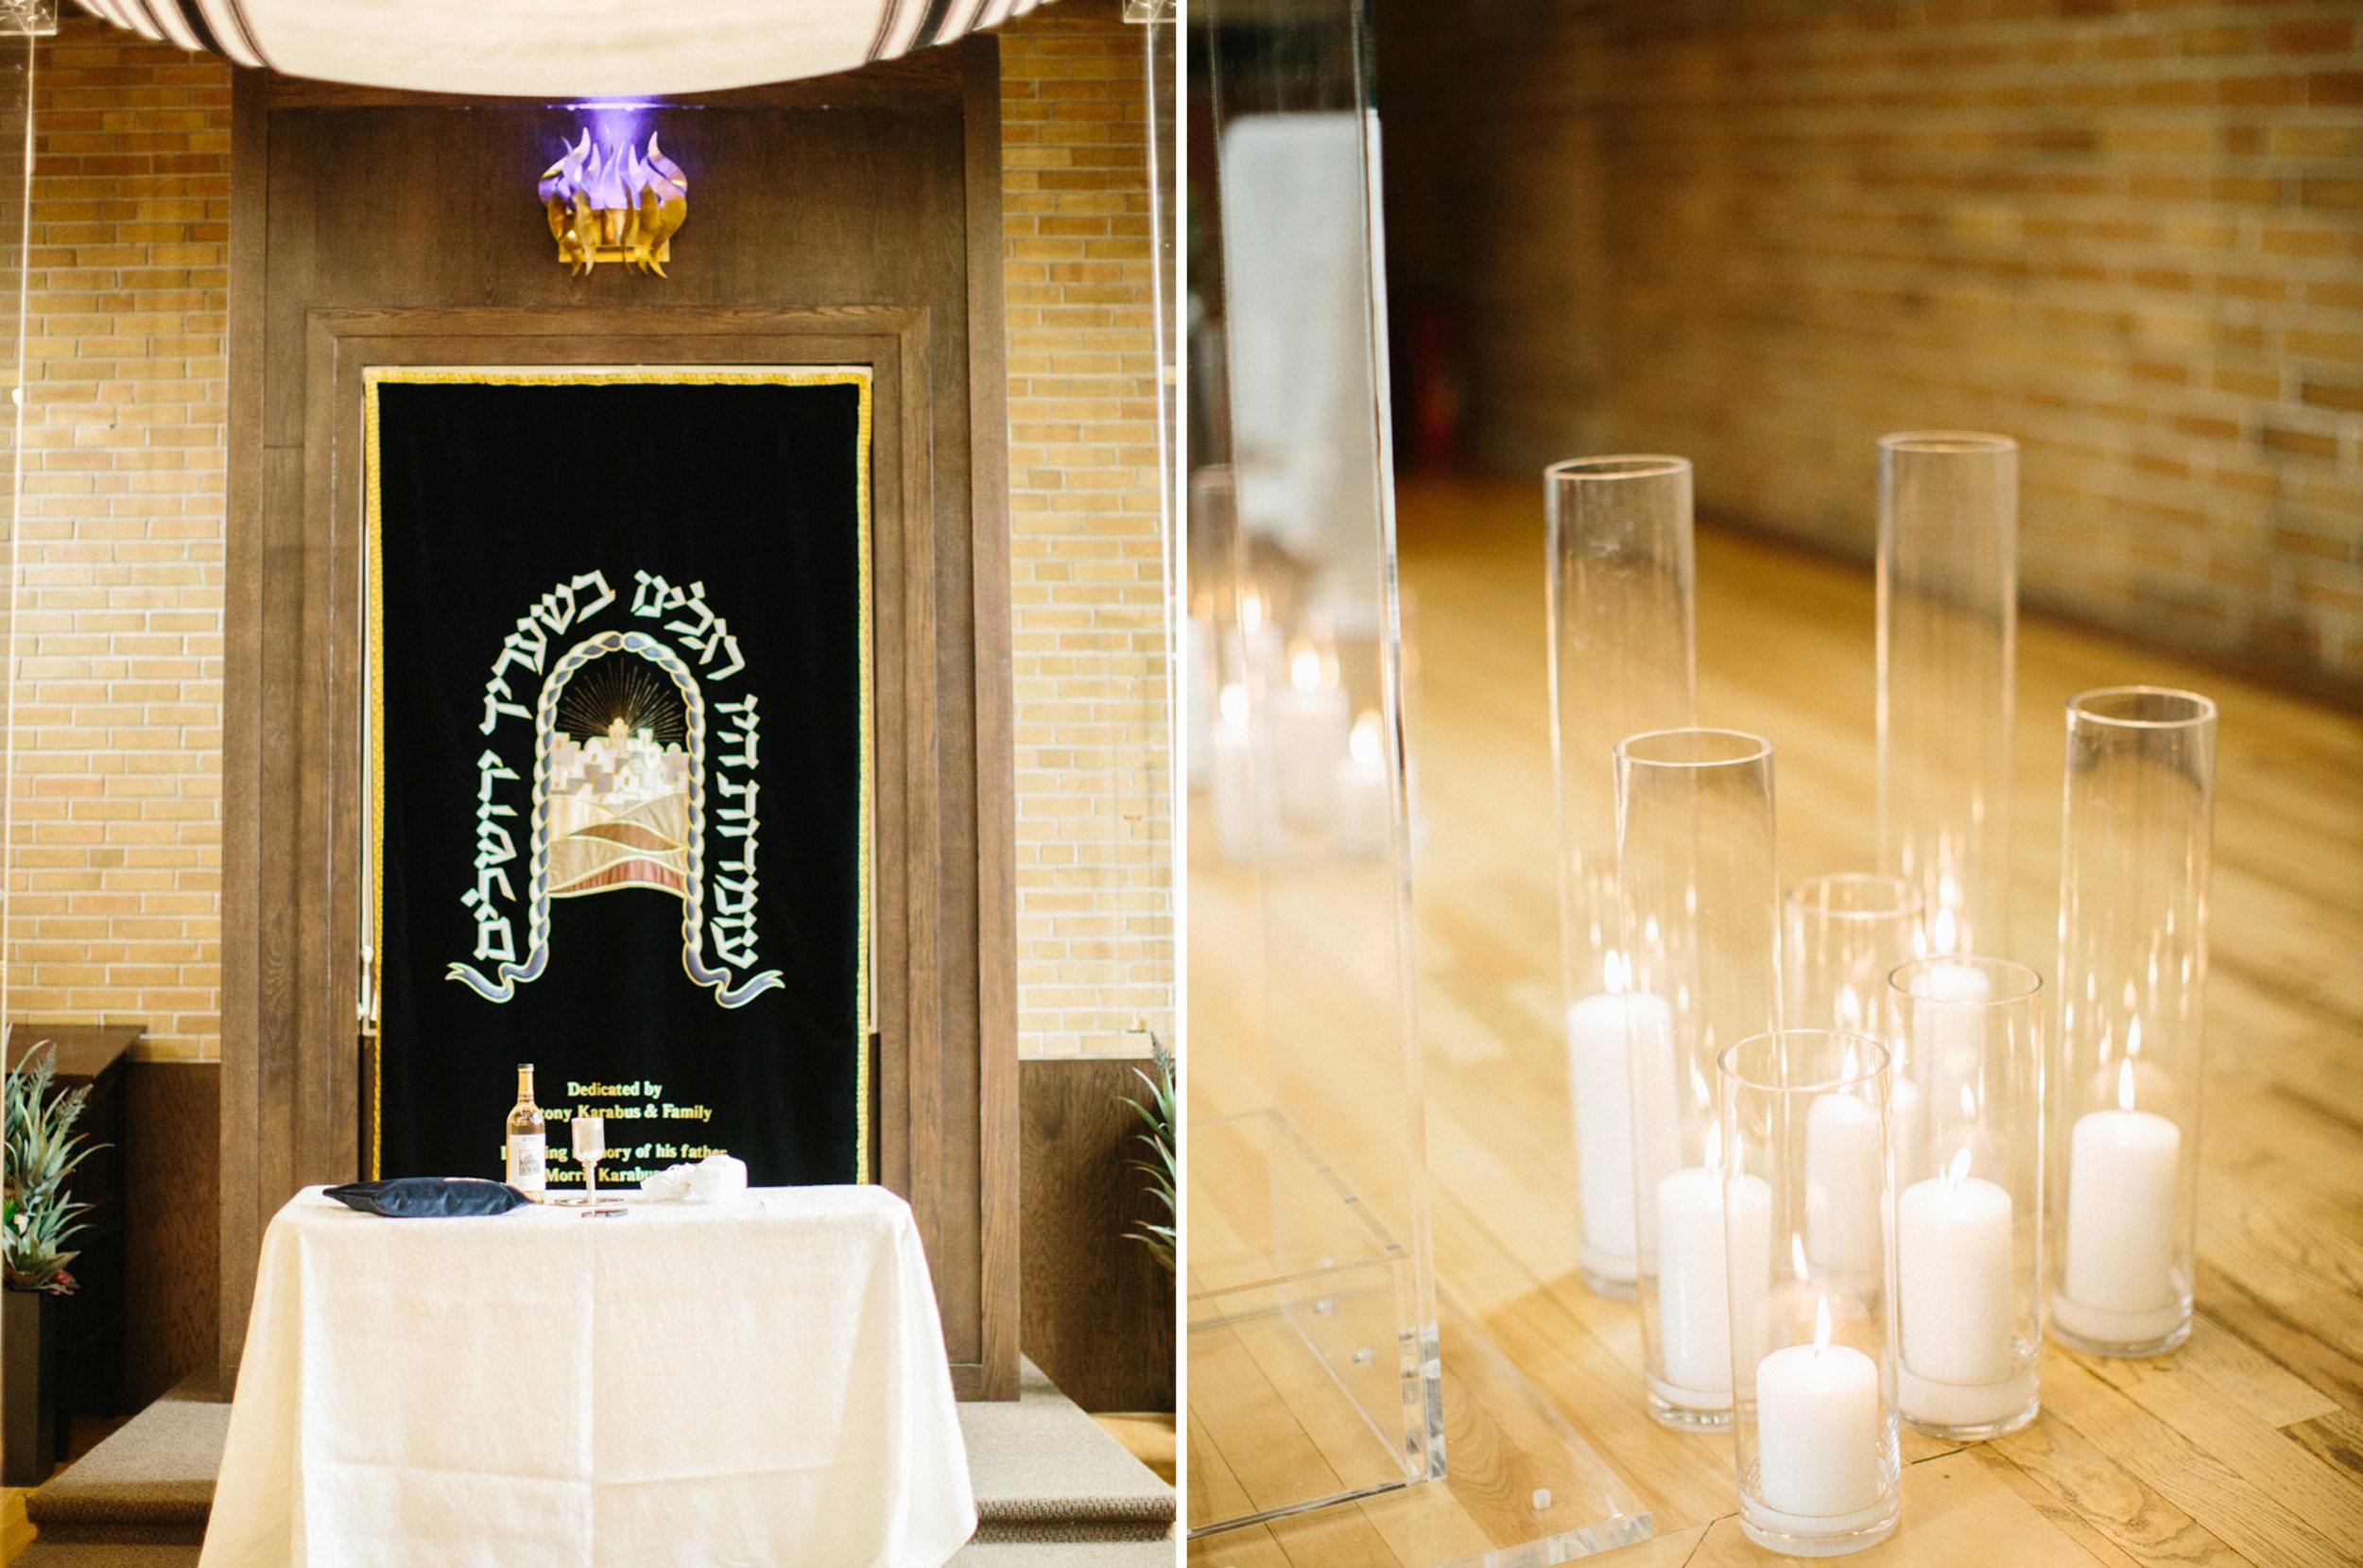 toronto_wedding_photographer_fine_art_the_great_hall9.jpg